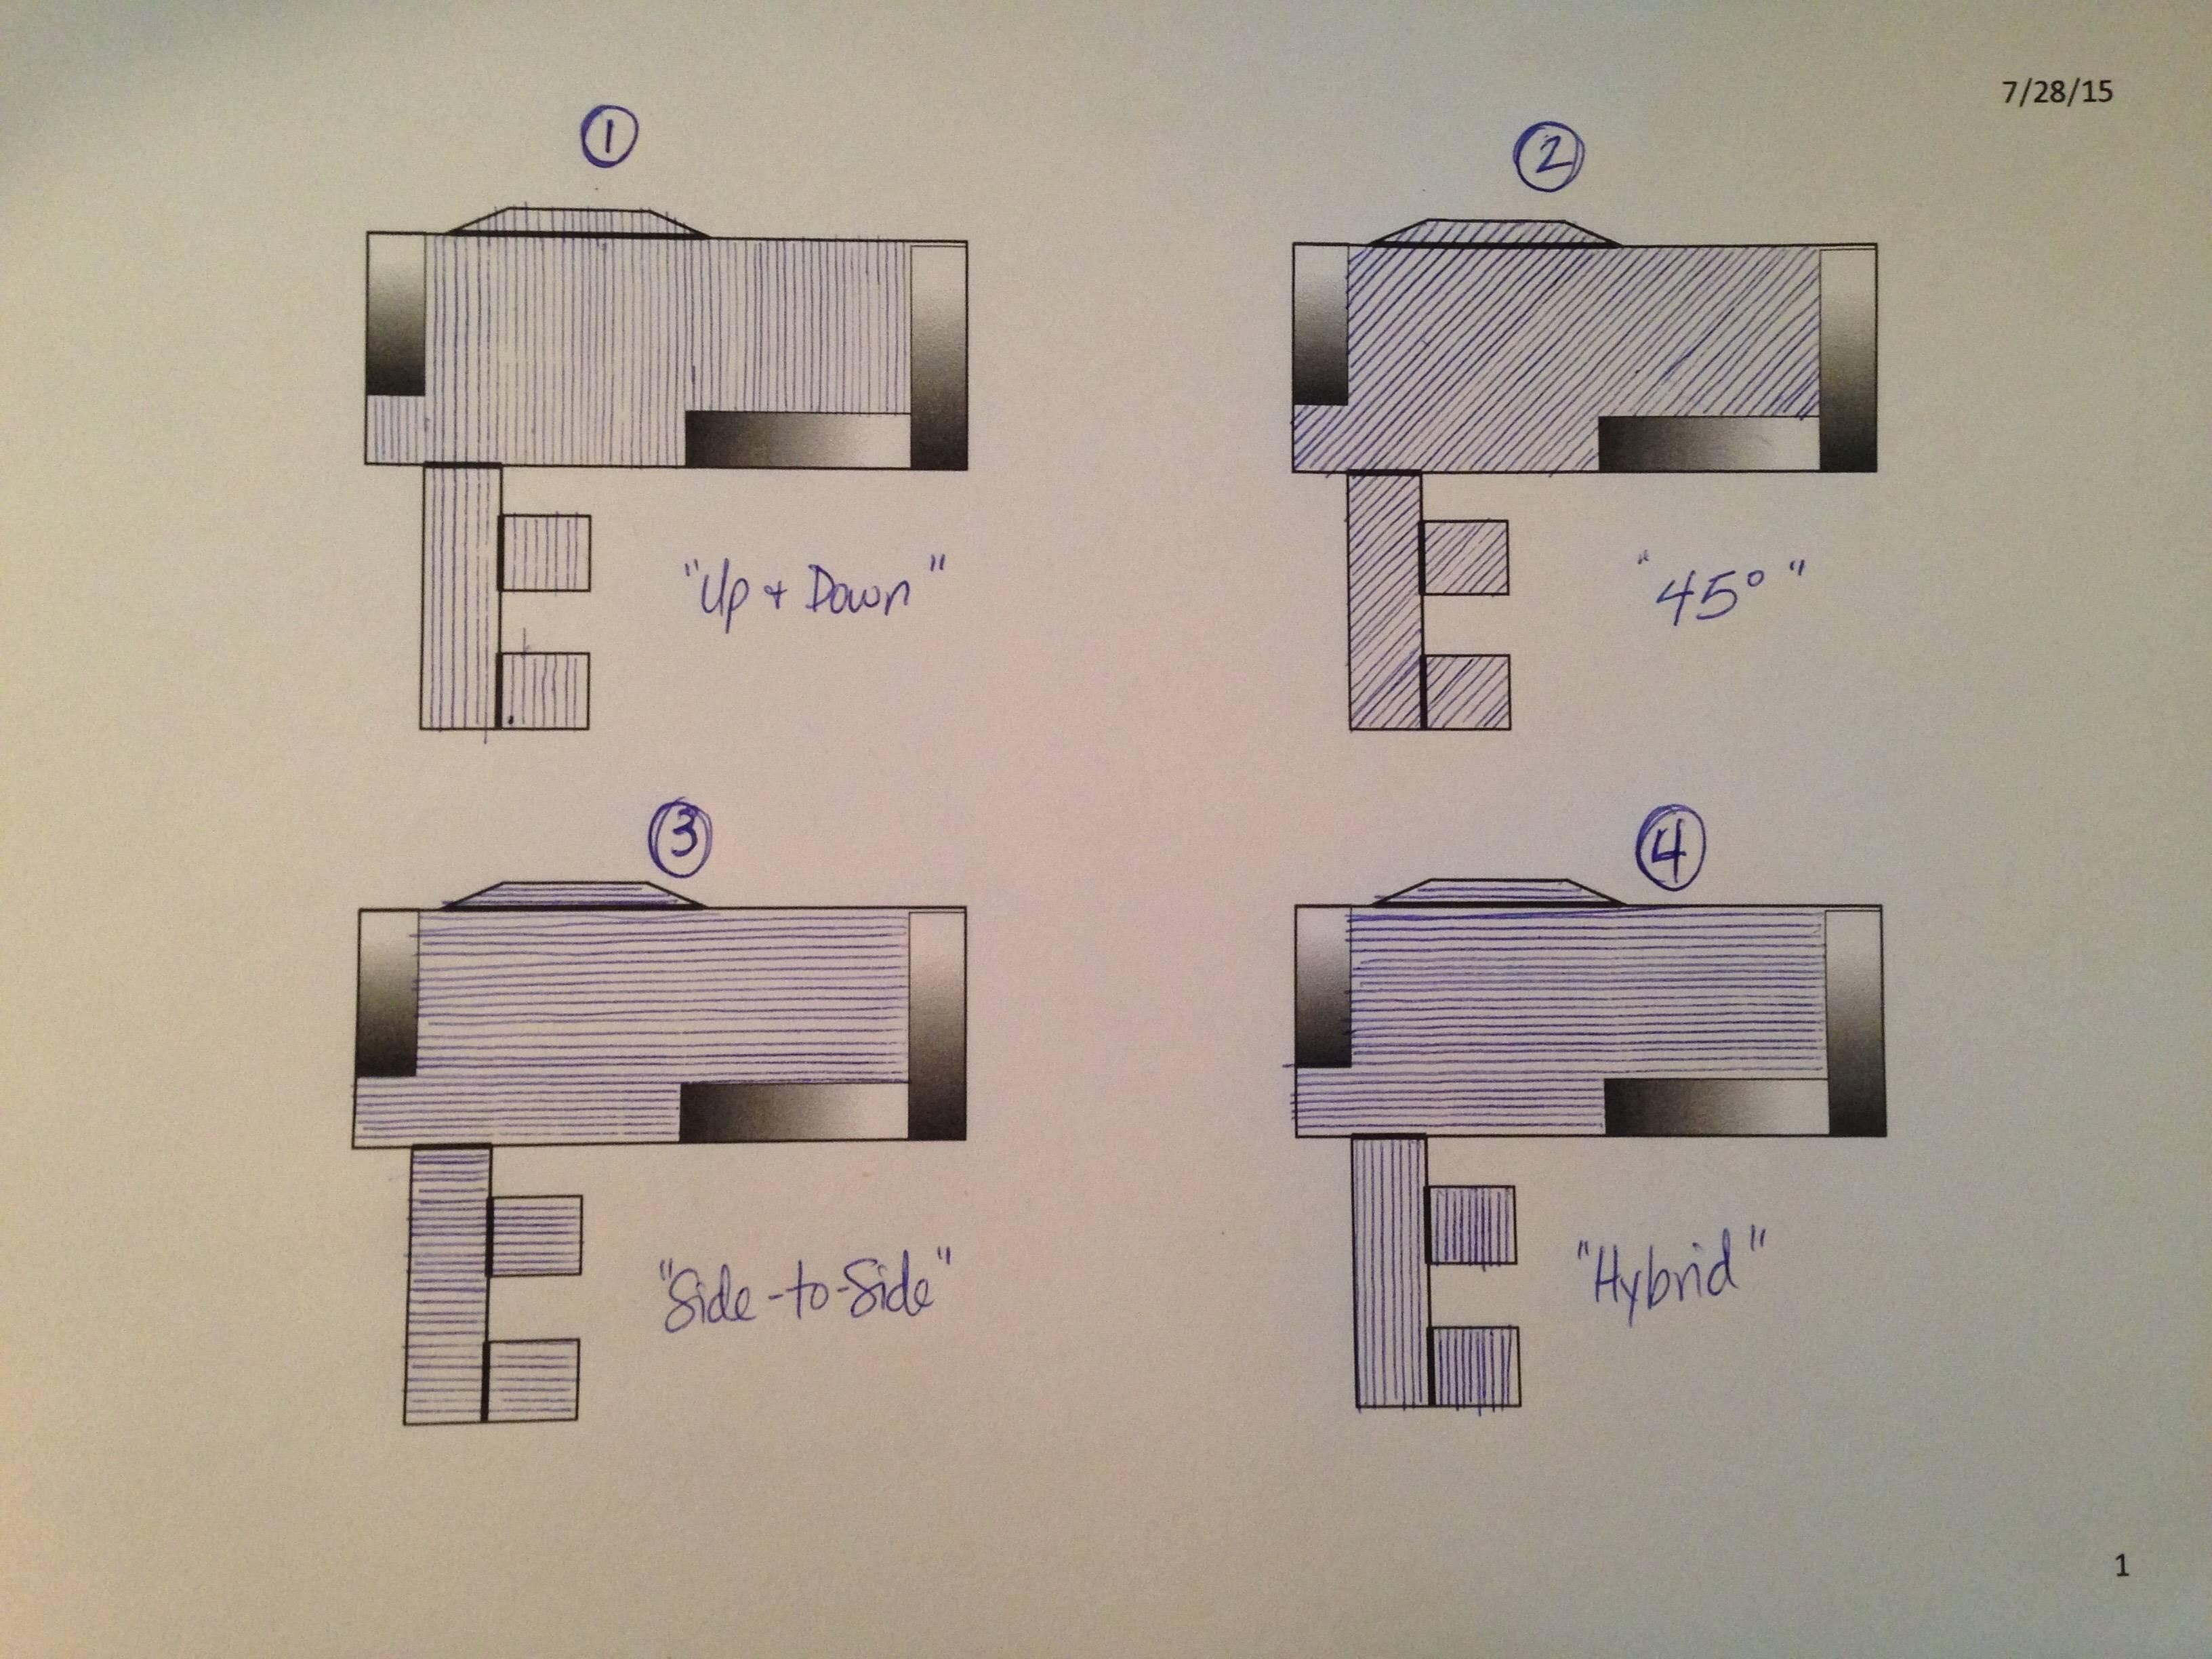 flooring  New Hardwood Floor Layout  Home Improvement